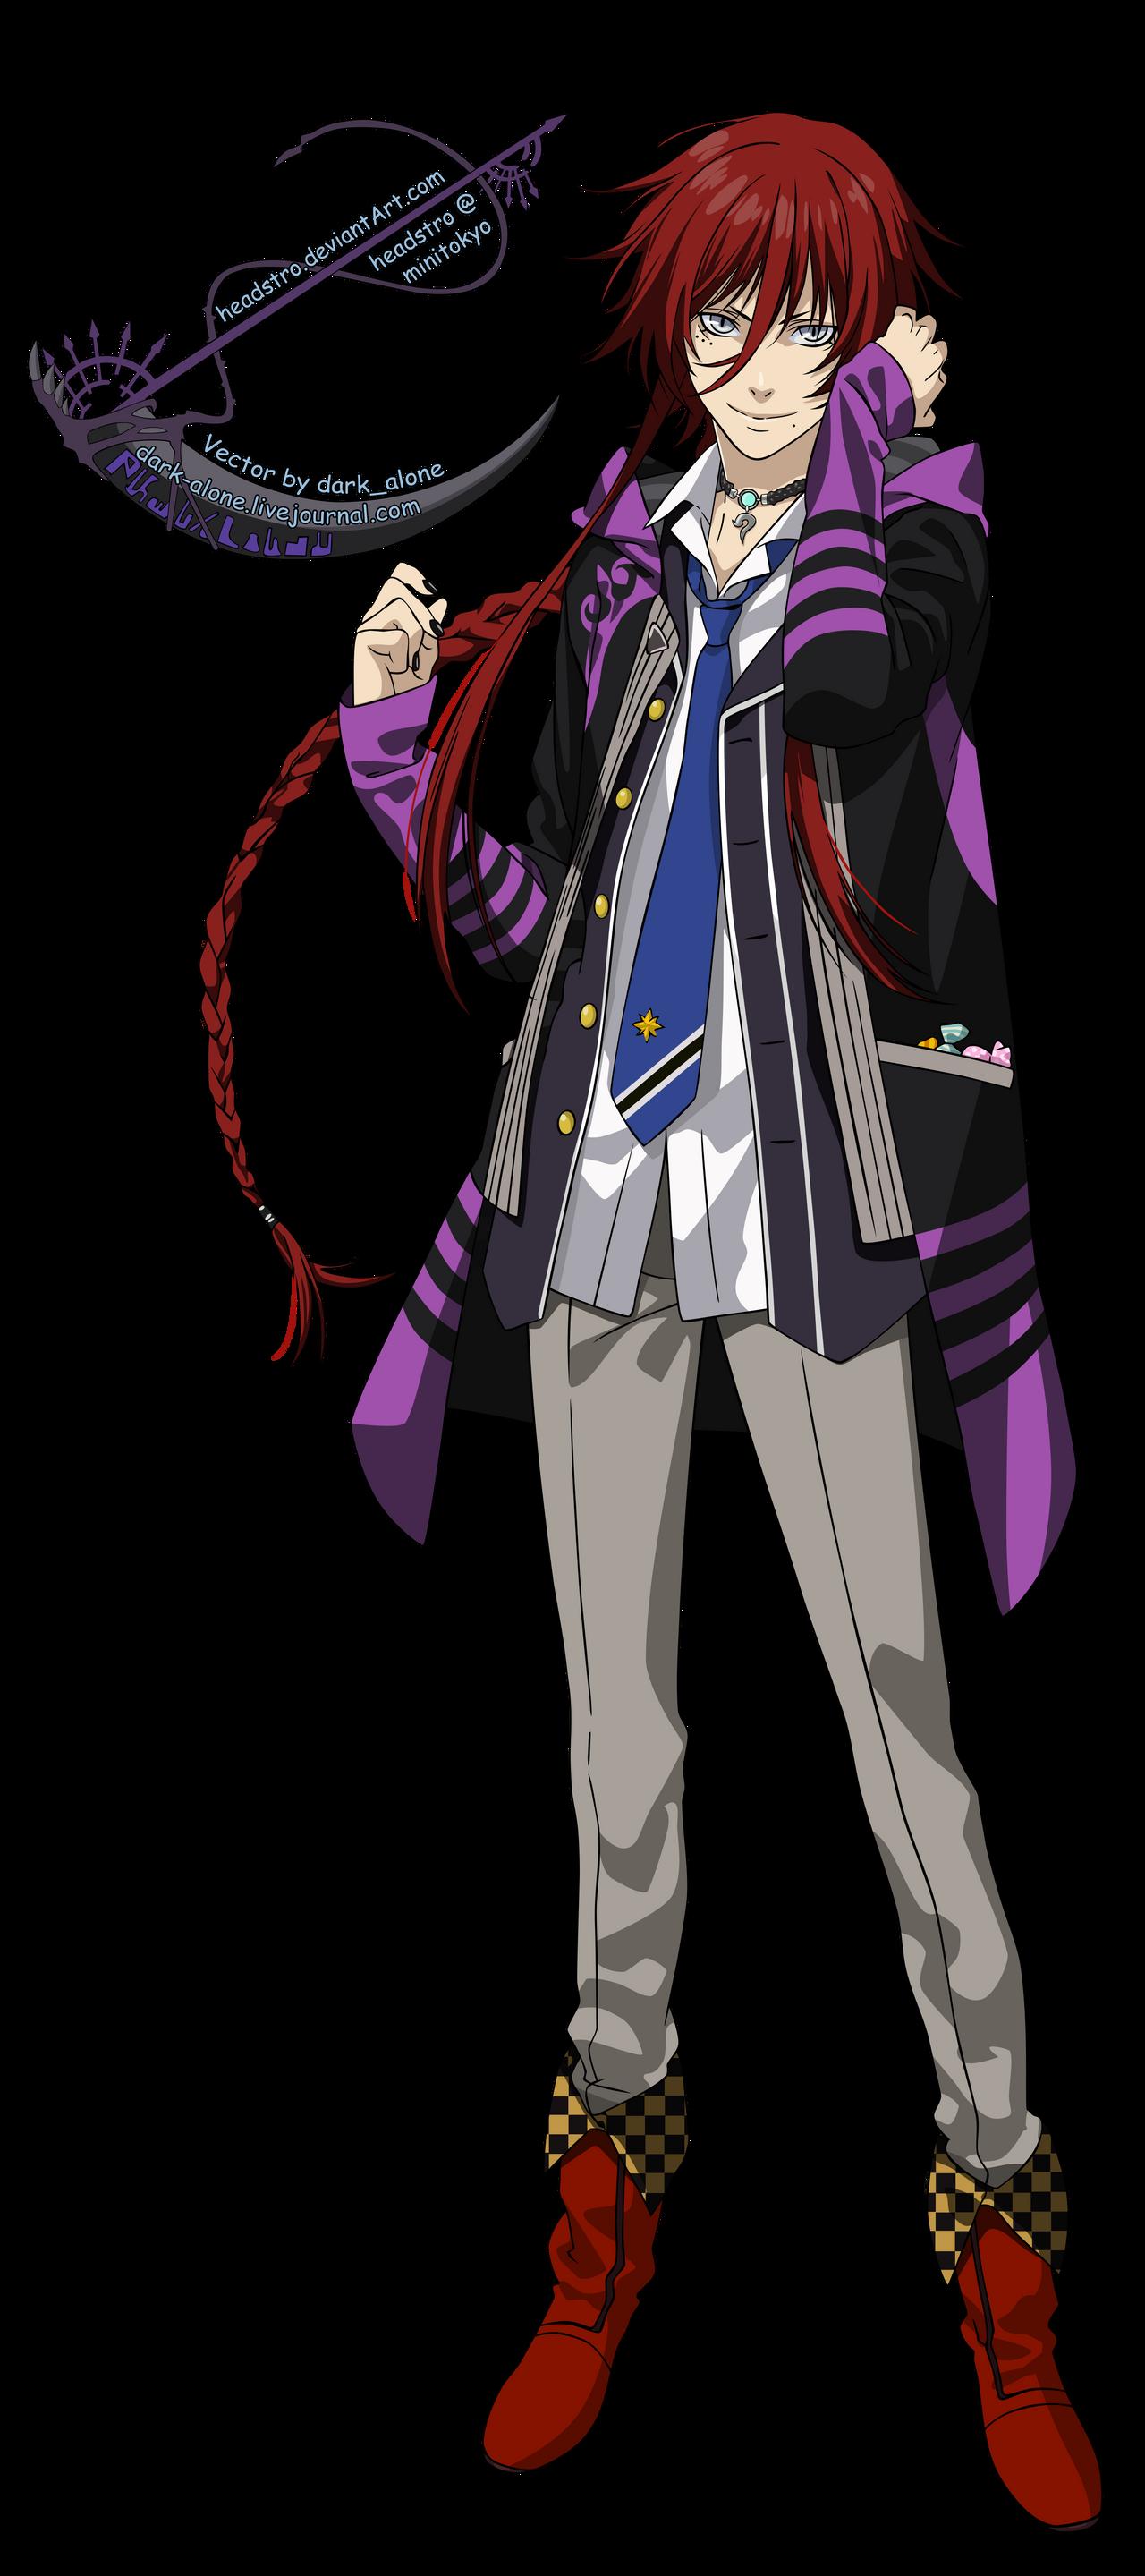 Loki Laevatein - Kamigami no Asobi - Vector by headstro on DeviantArt